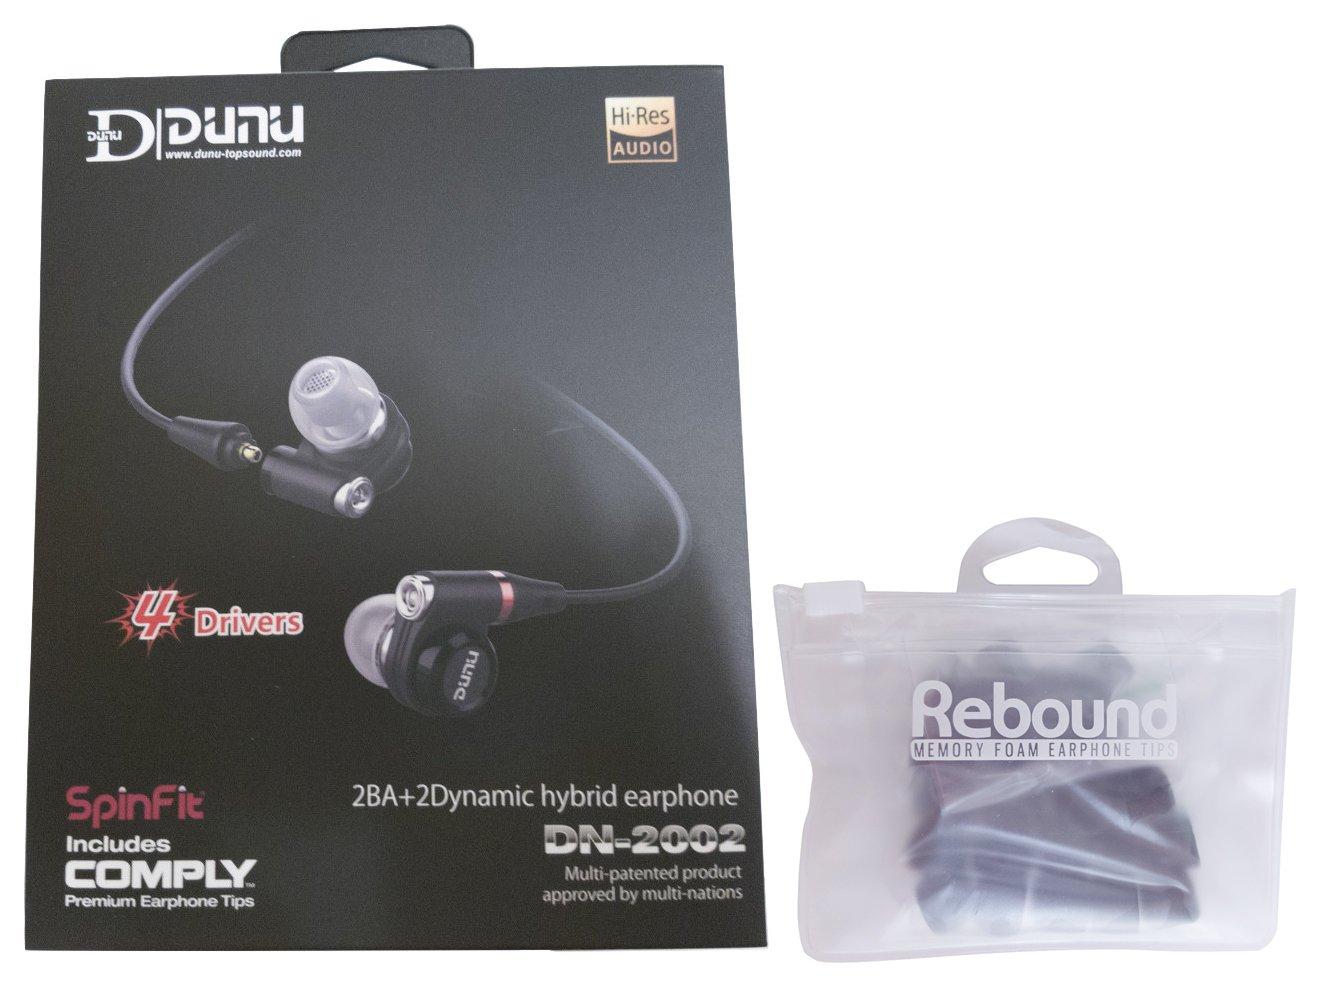 DUNU DN-2002 with Jumbo Rebound Memory Foam Ear Tips Bundle, 2 Items